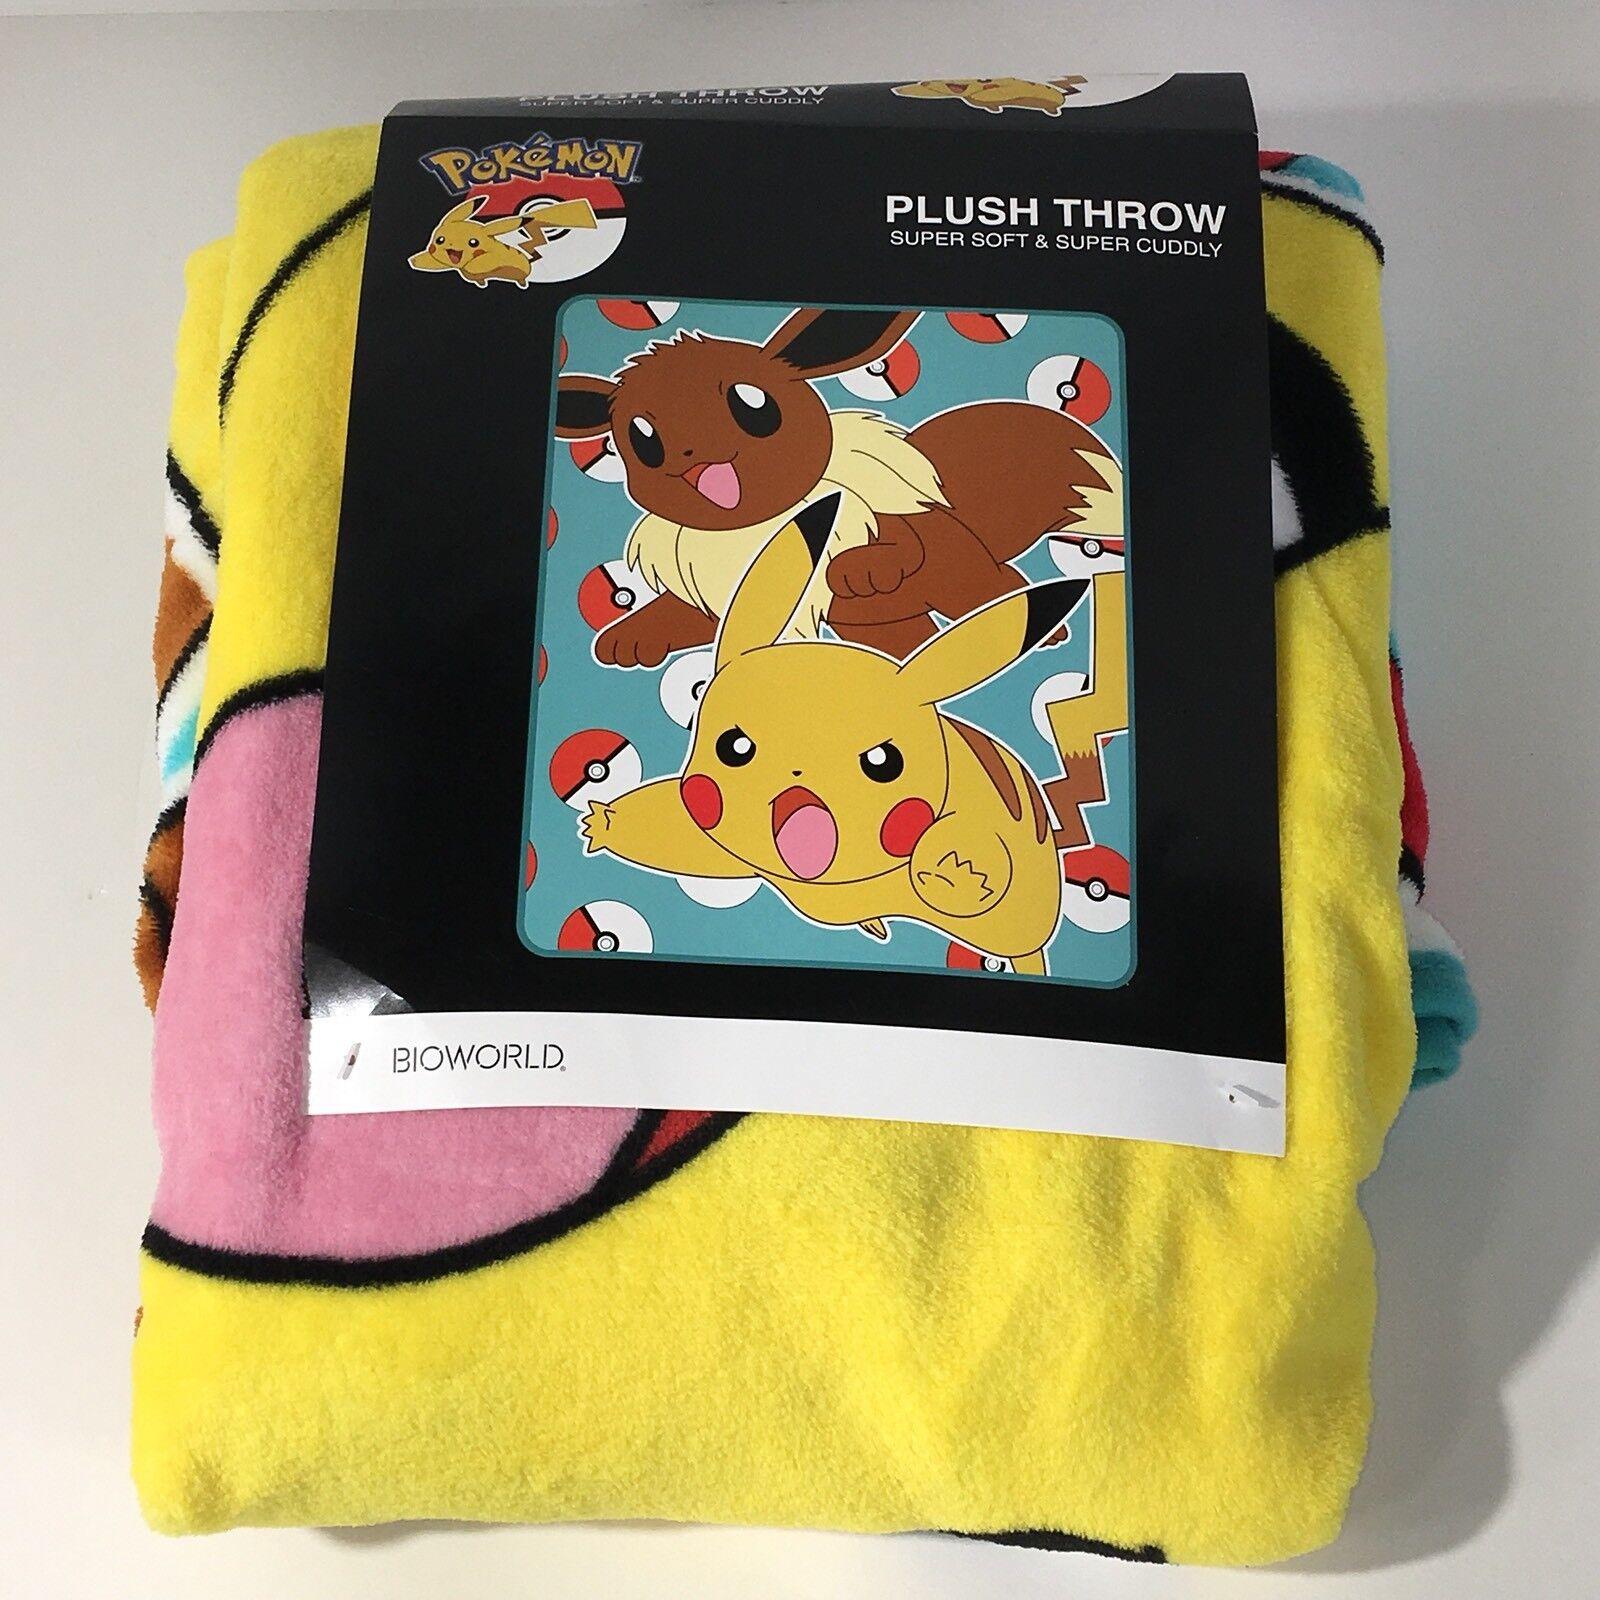 Pokemon Pikachu And Eevee Jump Plush Fleece Throw Blanket Pokeball Bioworld New